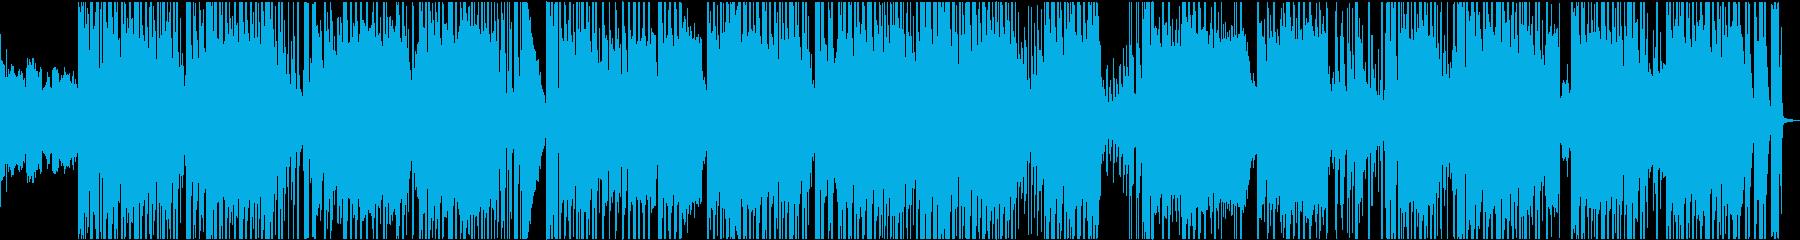 LOFIでやんちゃ感のあるHIP HOPの再生済みの波形